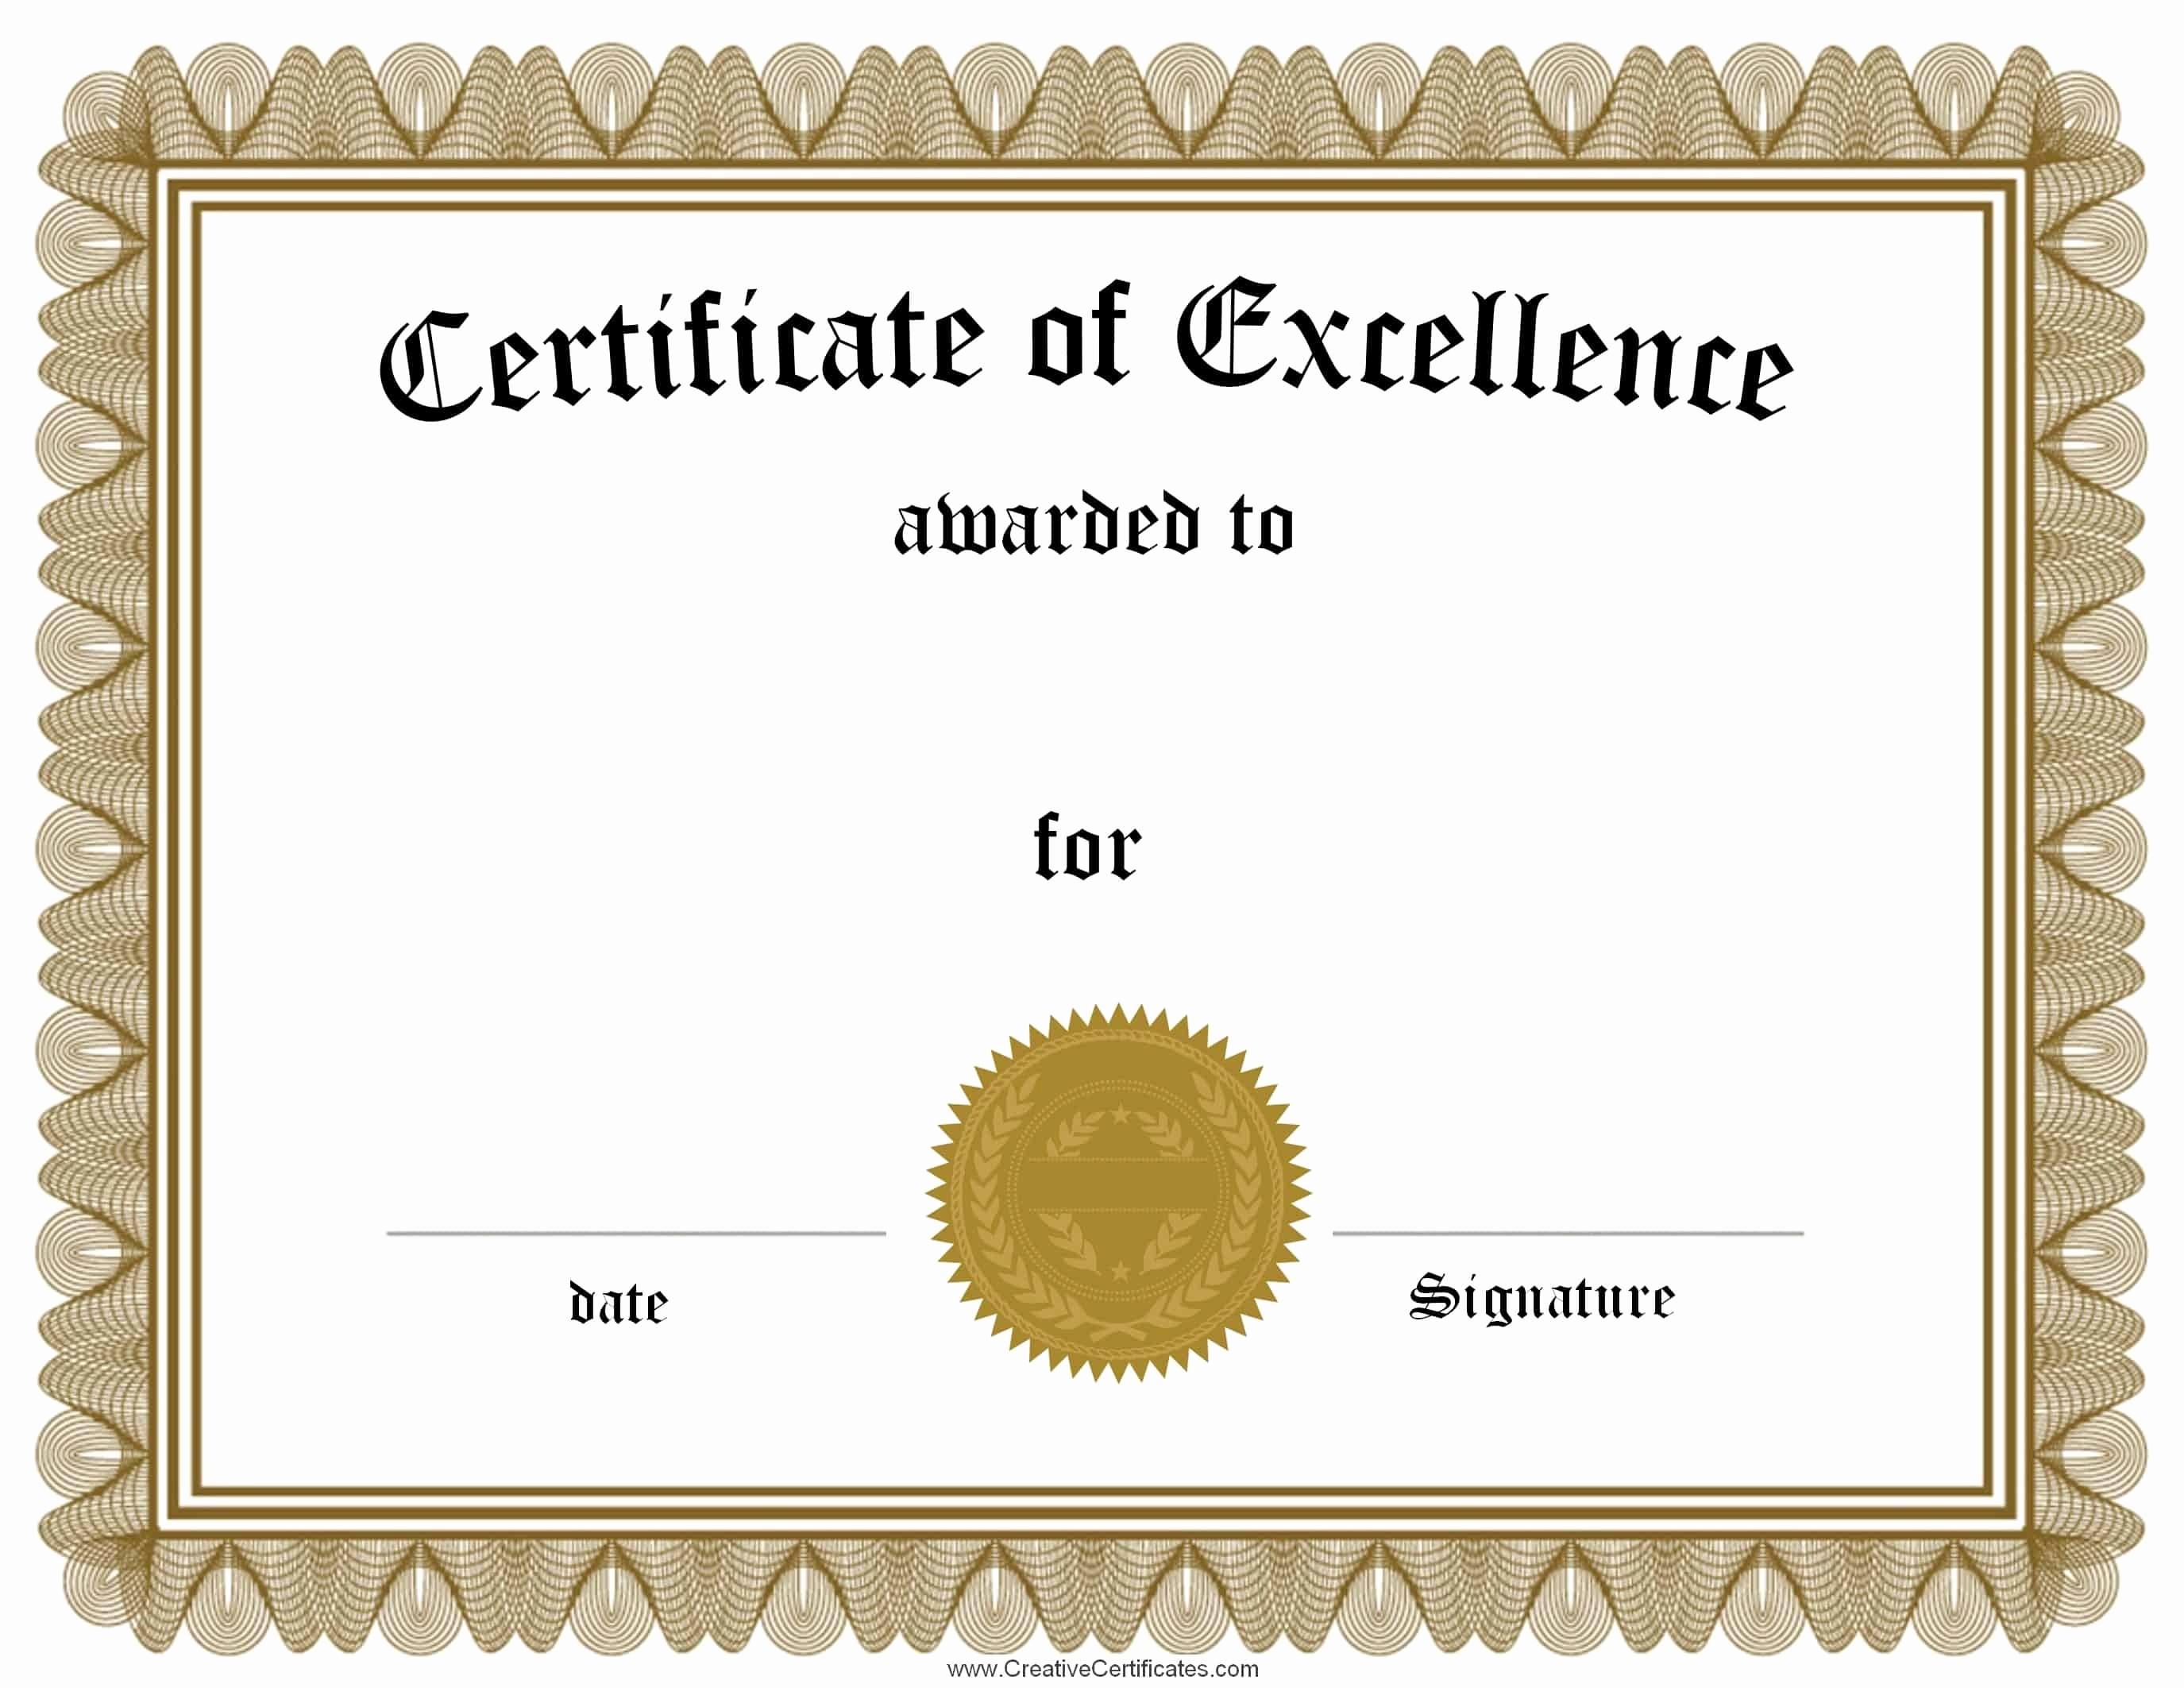 Certificates Of Achievement Templates Free Unique Free Customizable Certificate Of Achievement